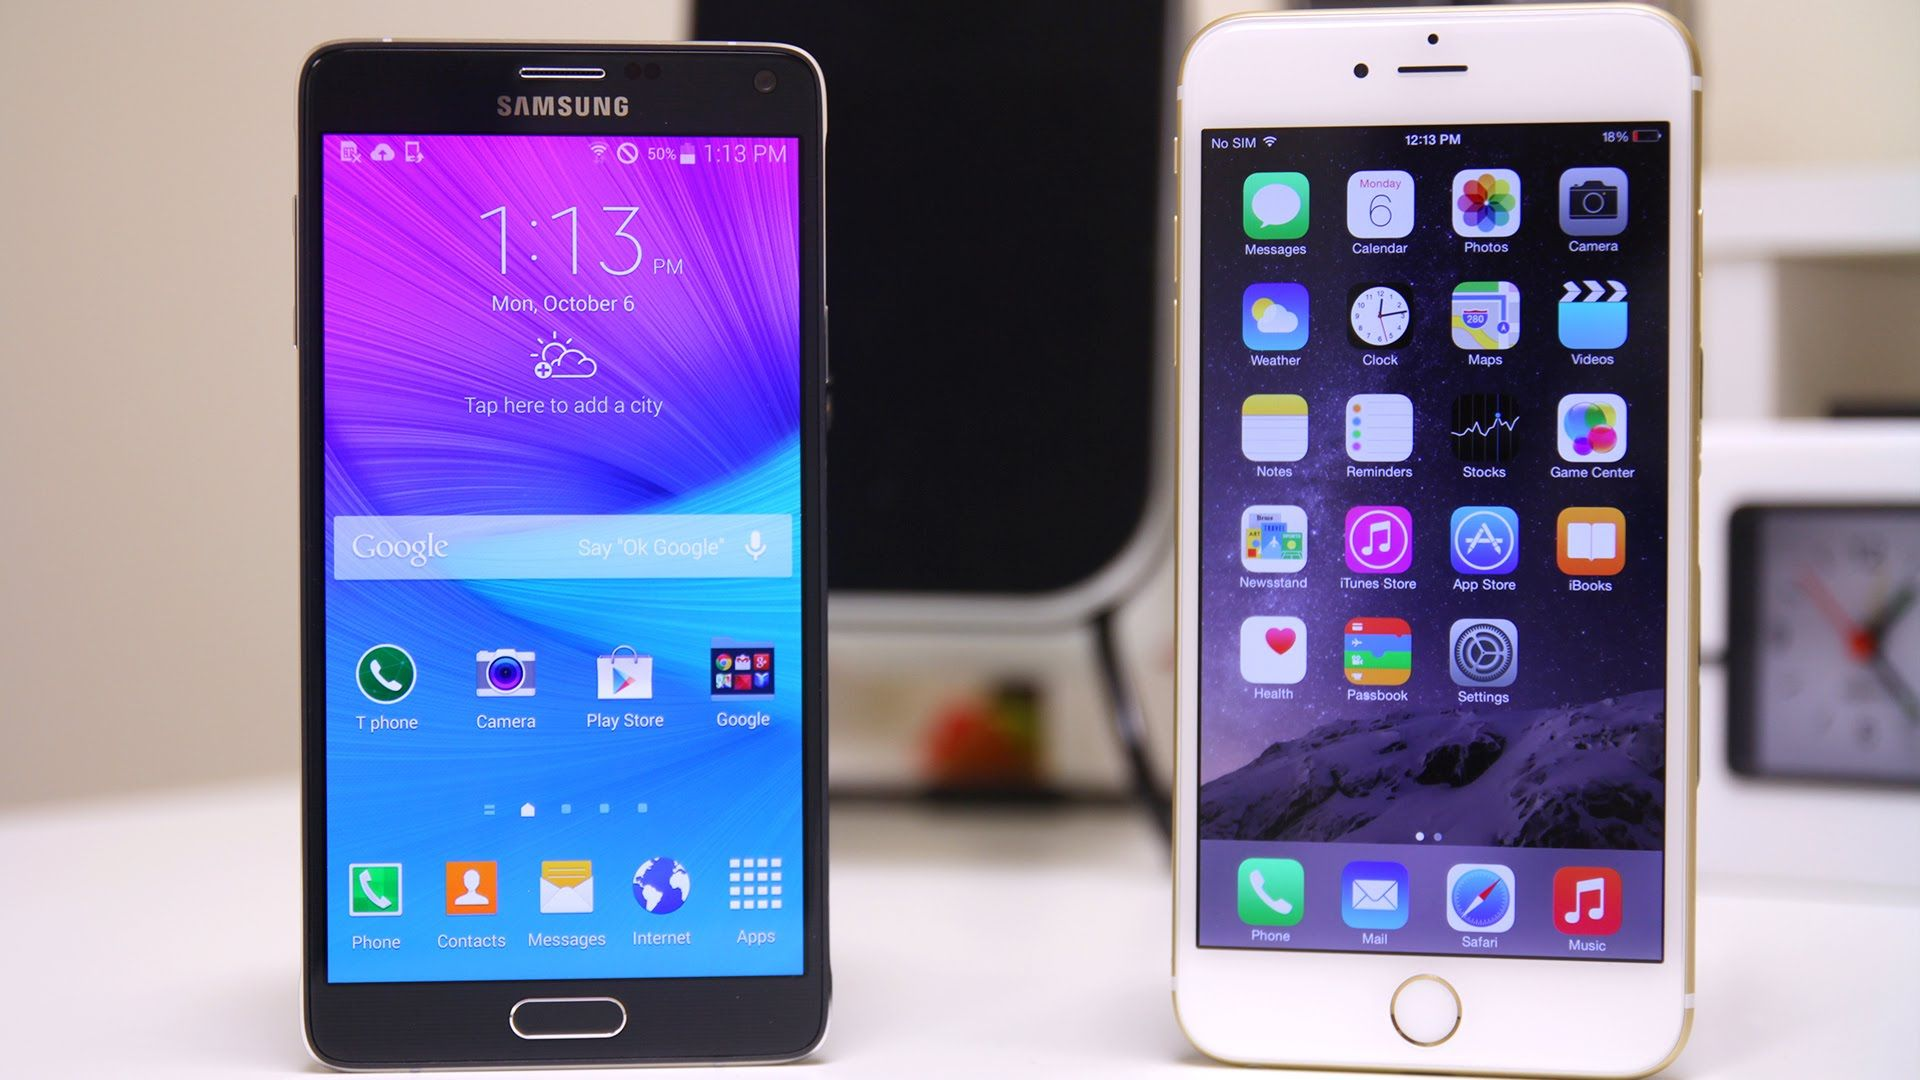 Samsung Galaxy Note 4 Vs Iphone 6 Plus Full Comparison Iphone Samsung Galaxy Note 5